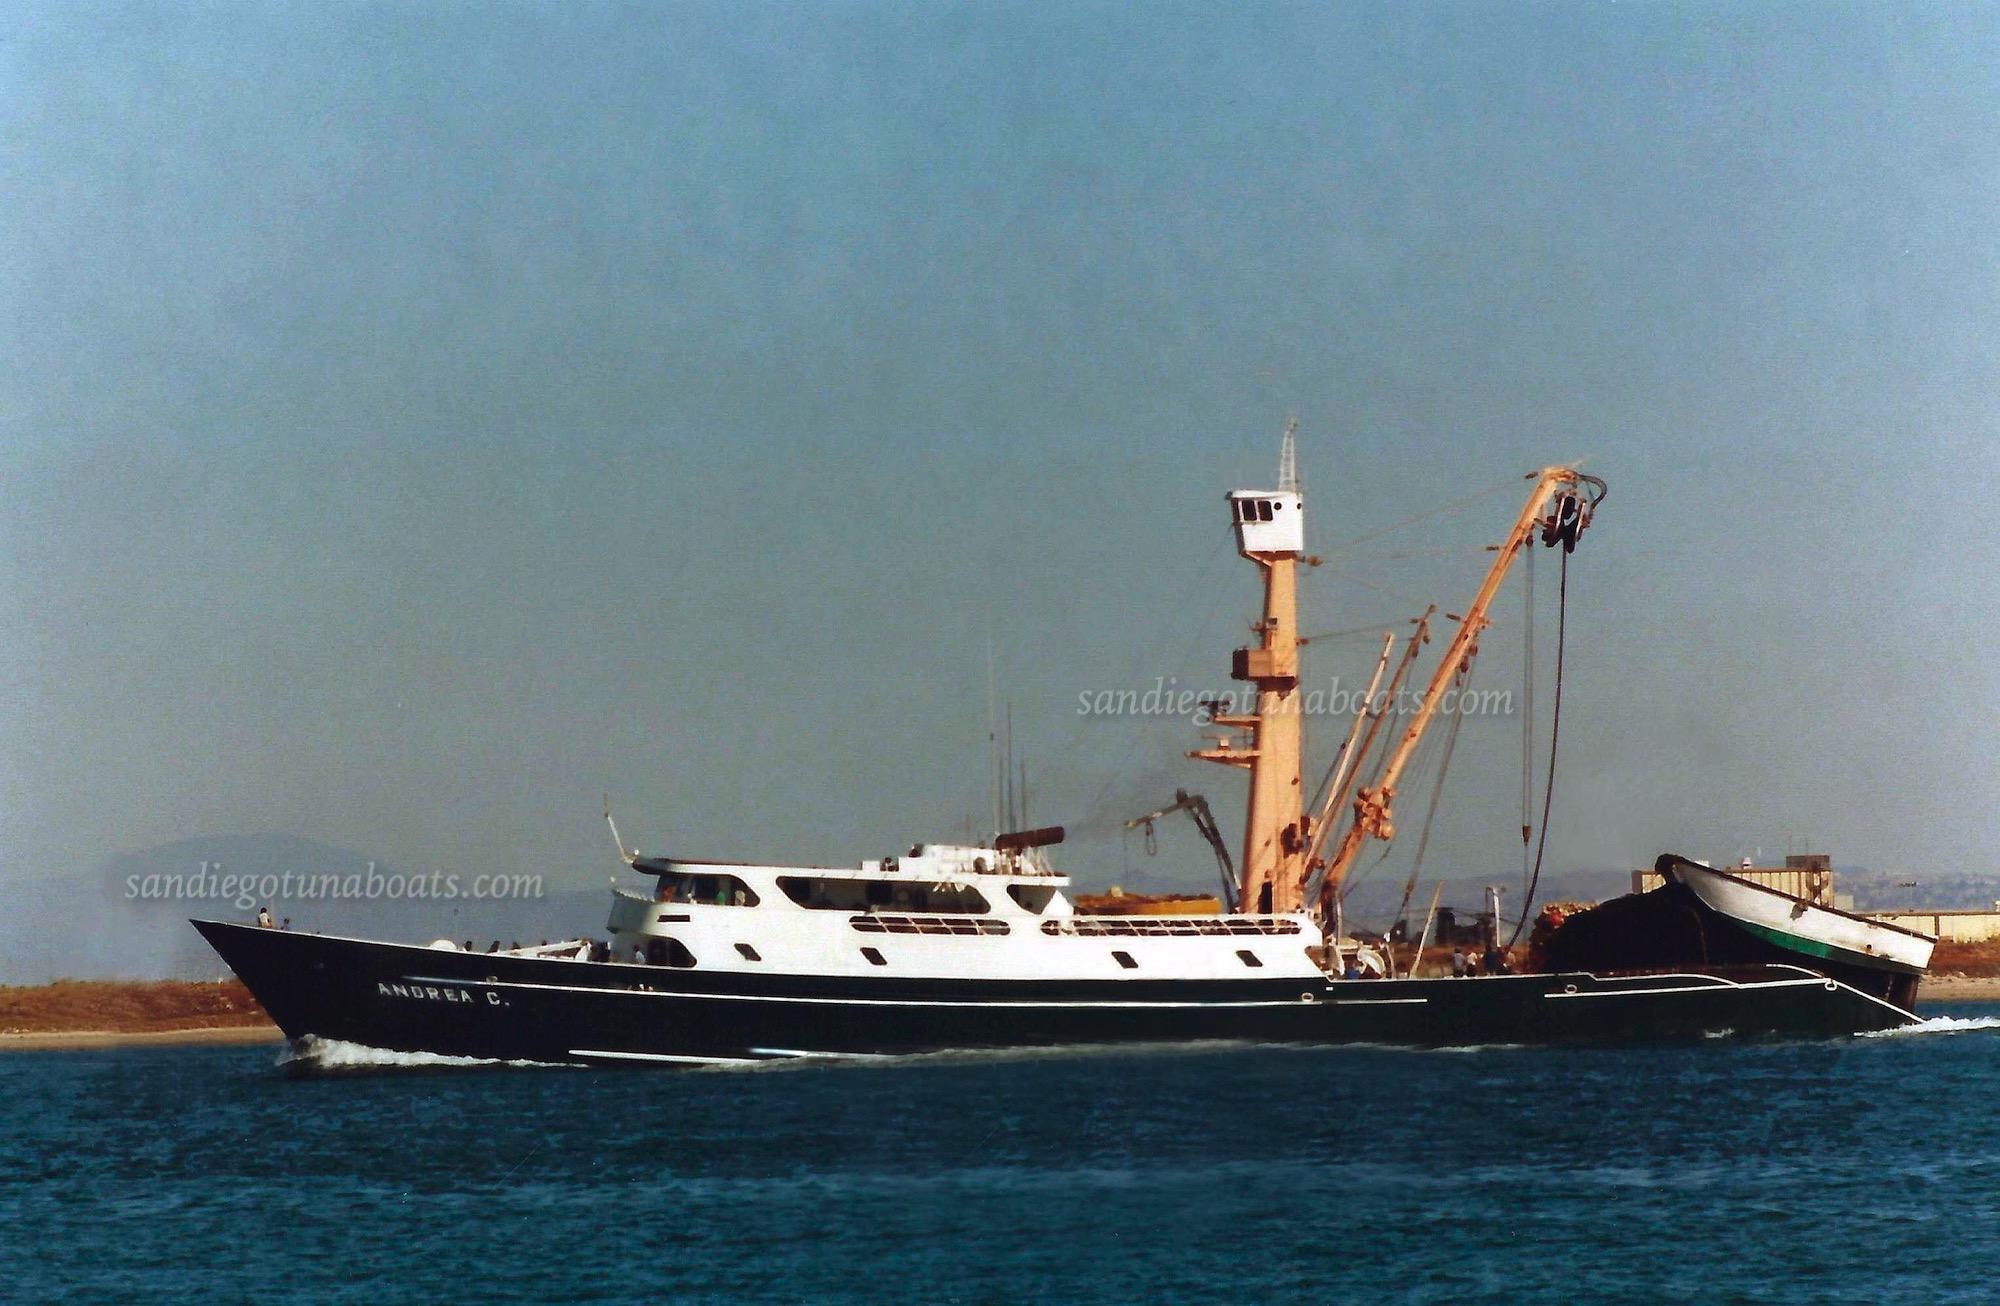 San Diego Tuna Boats